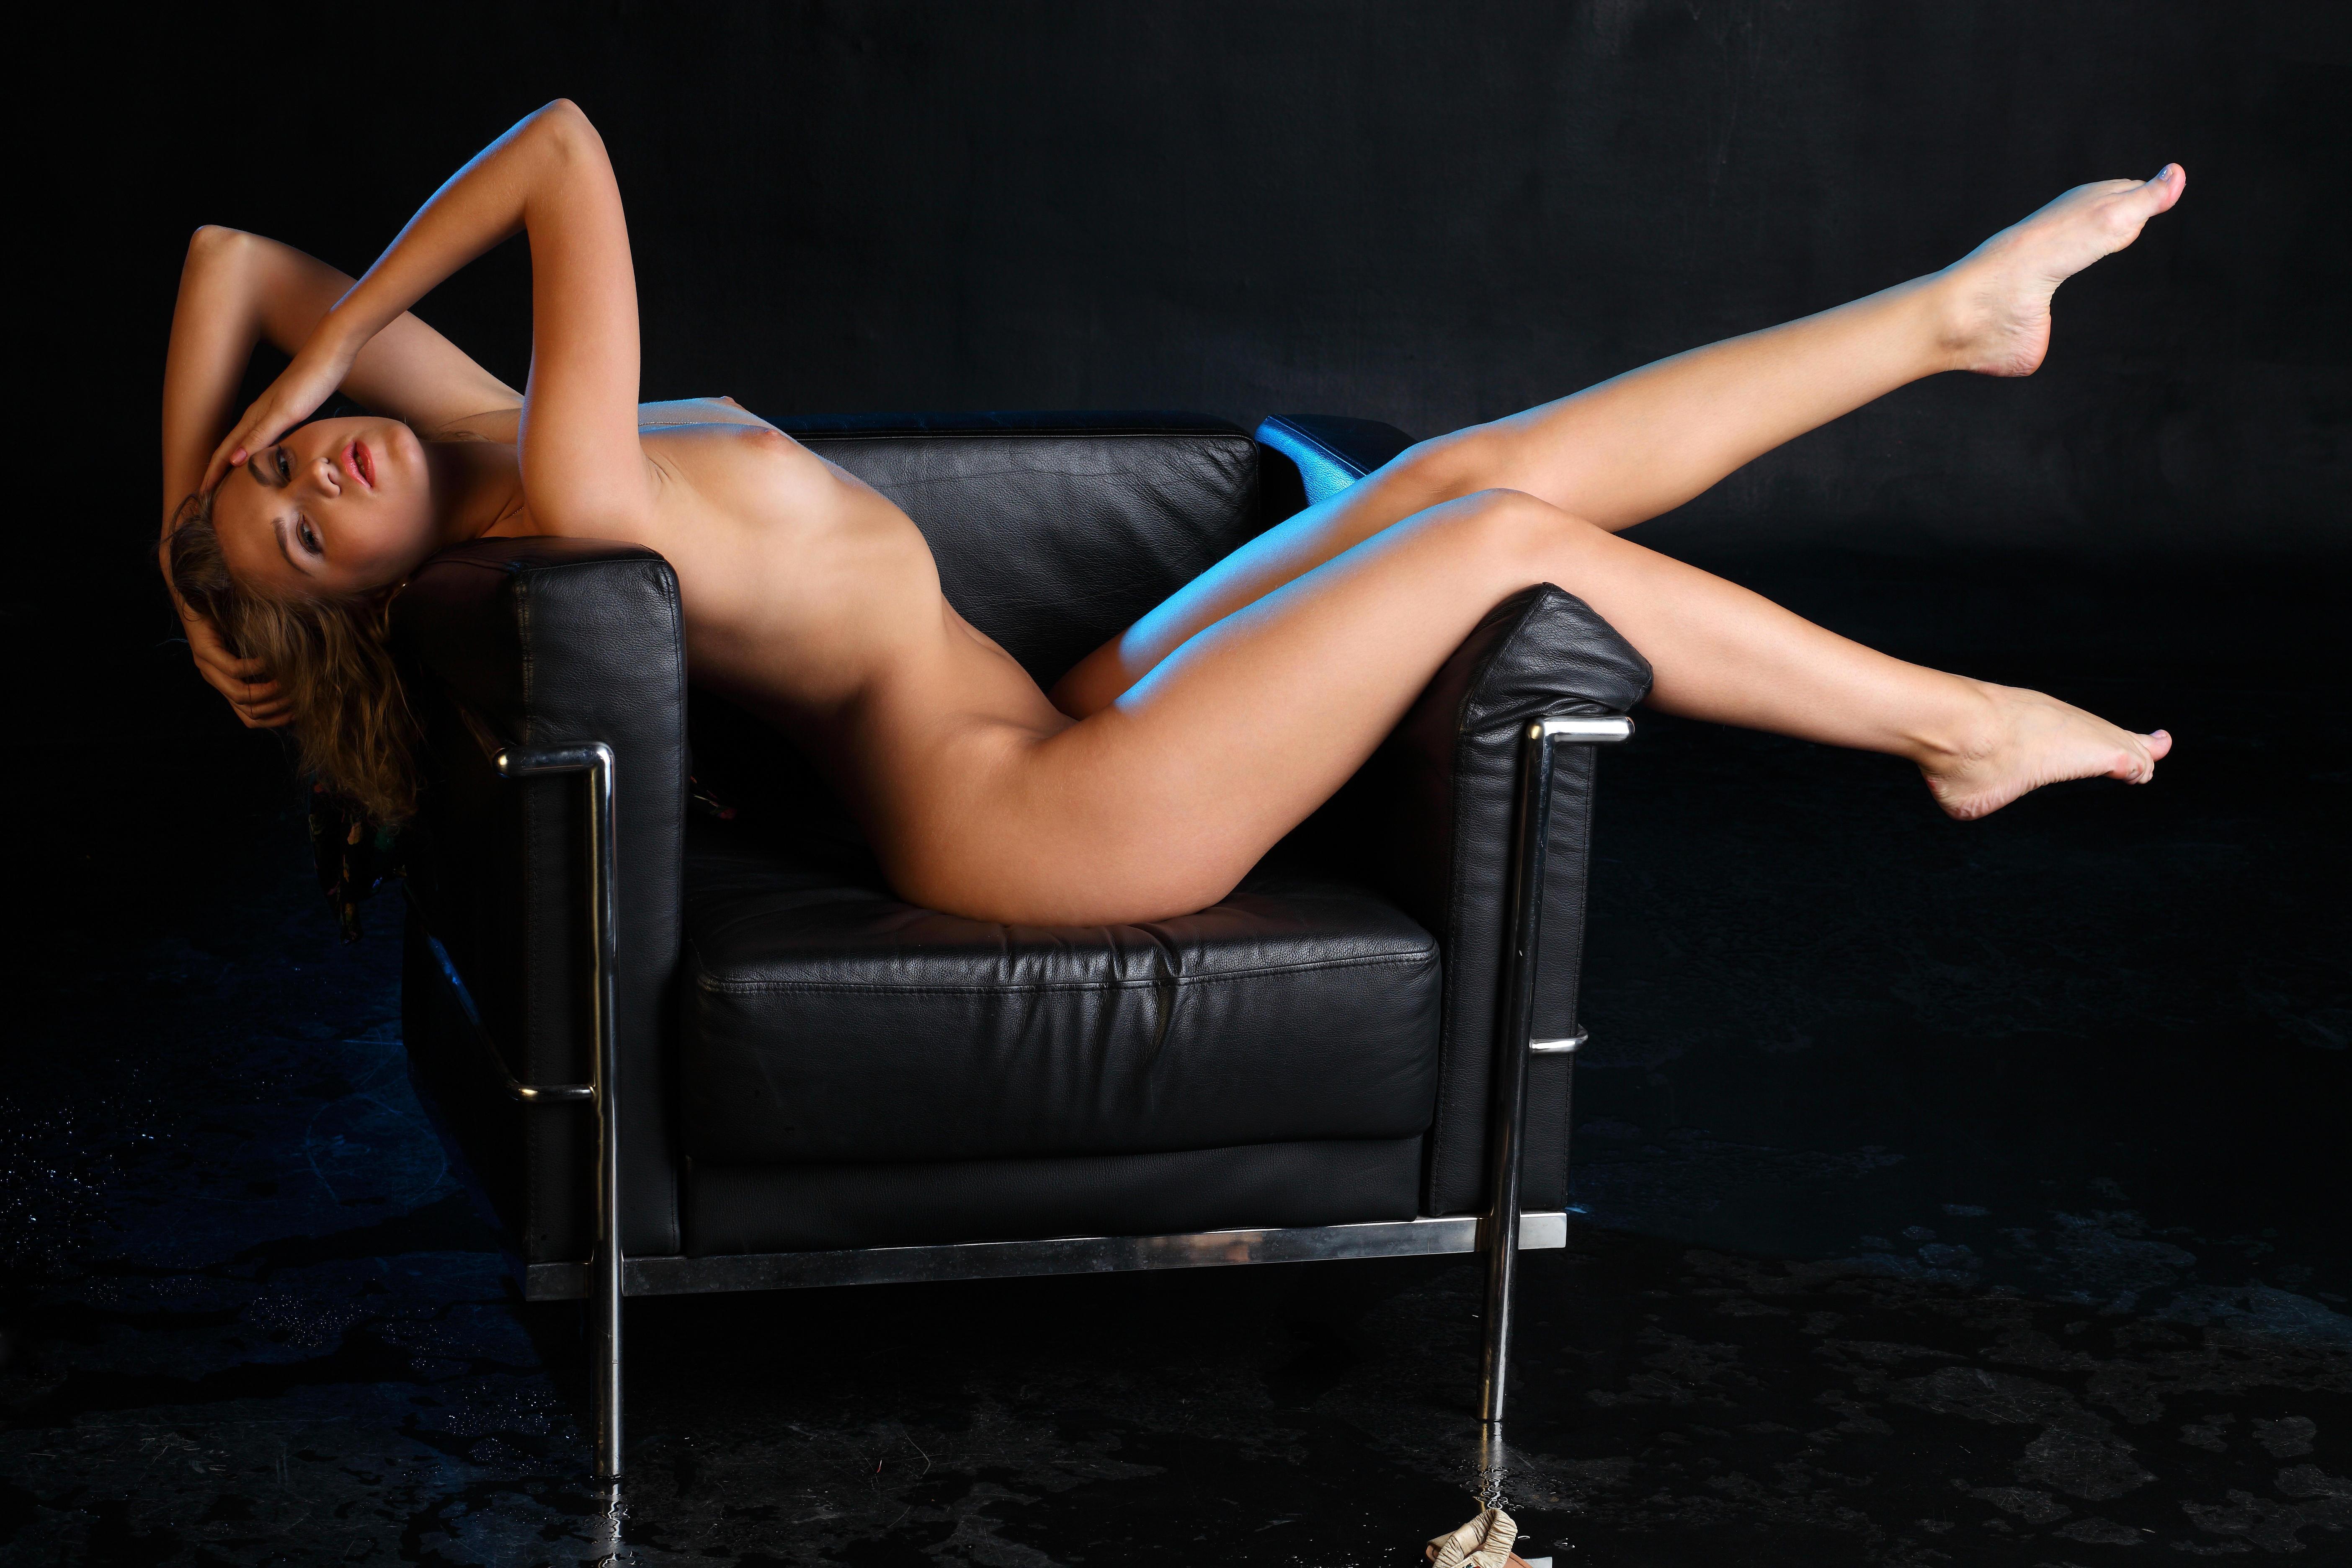 Claudia rossi porn gif